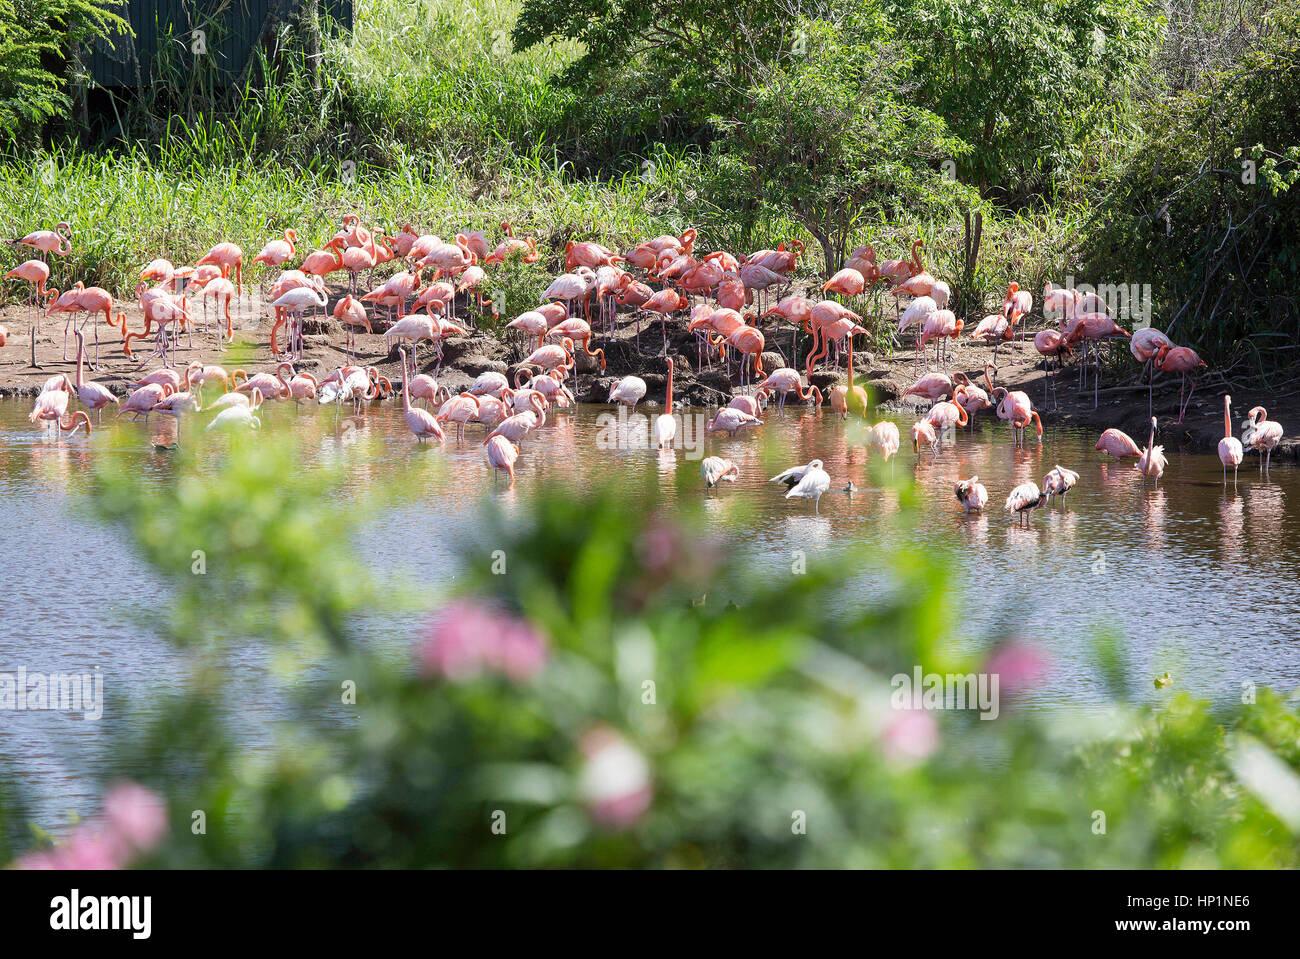 Flamingos British Virgin Islands Where